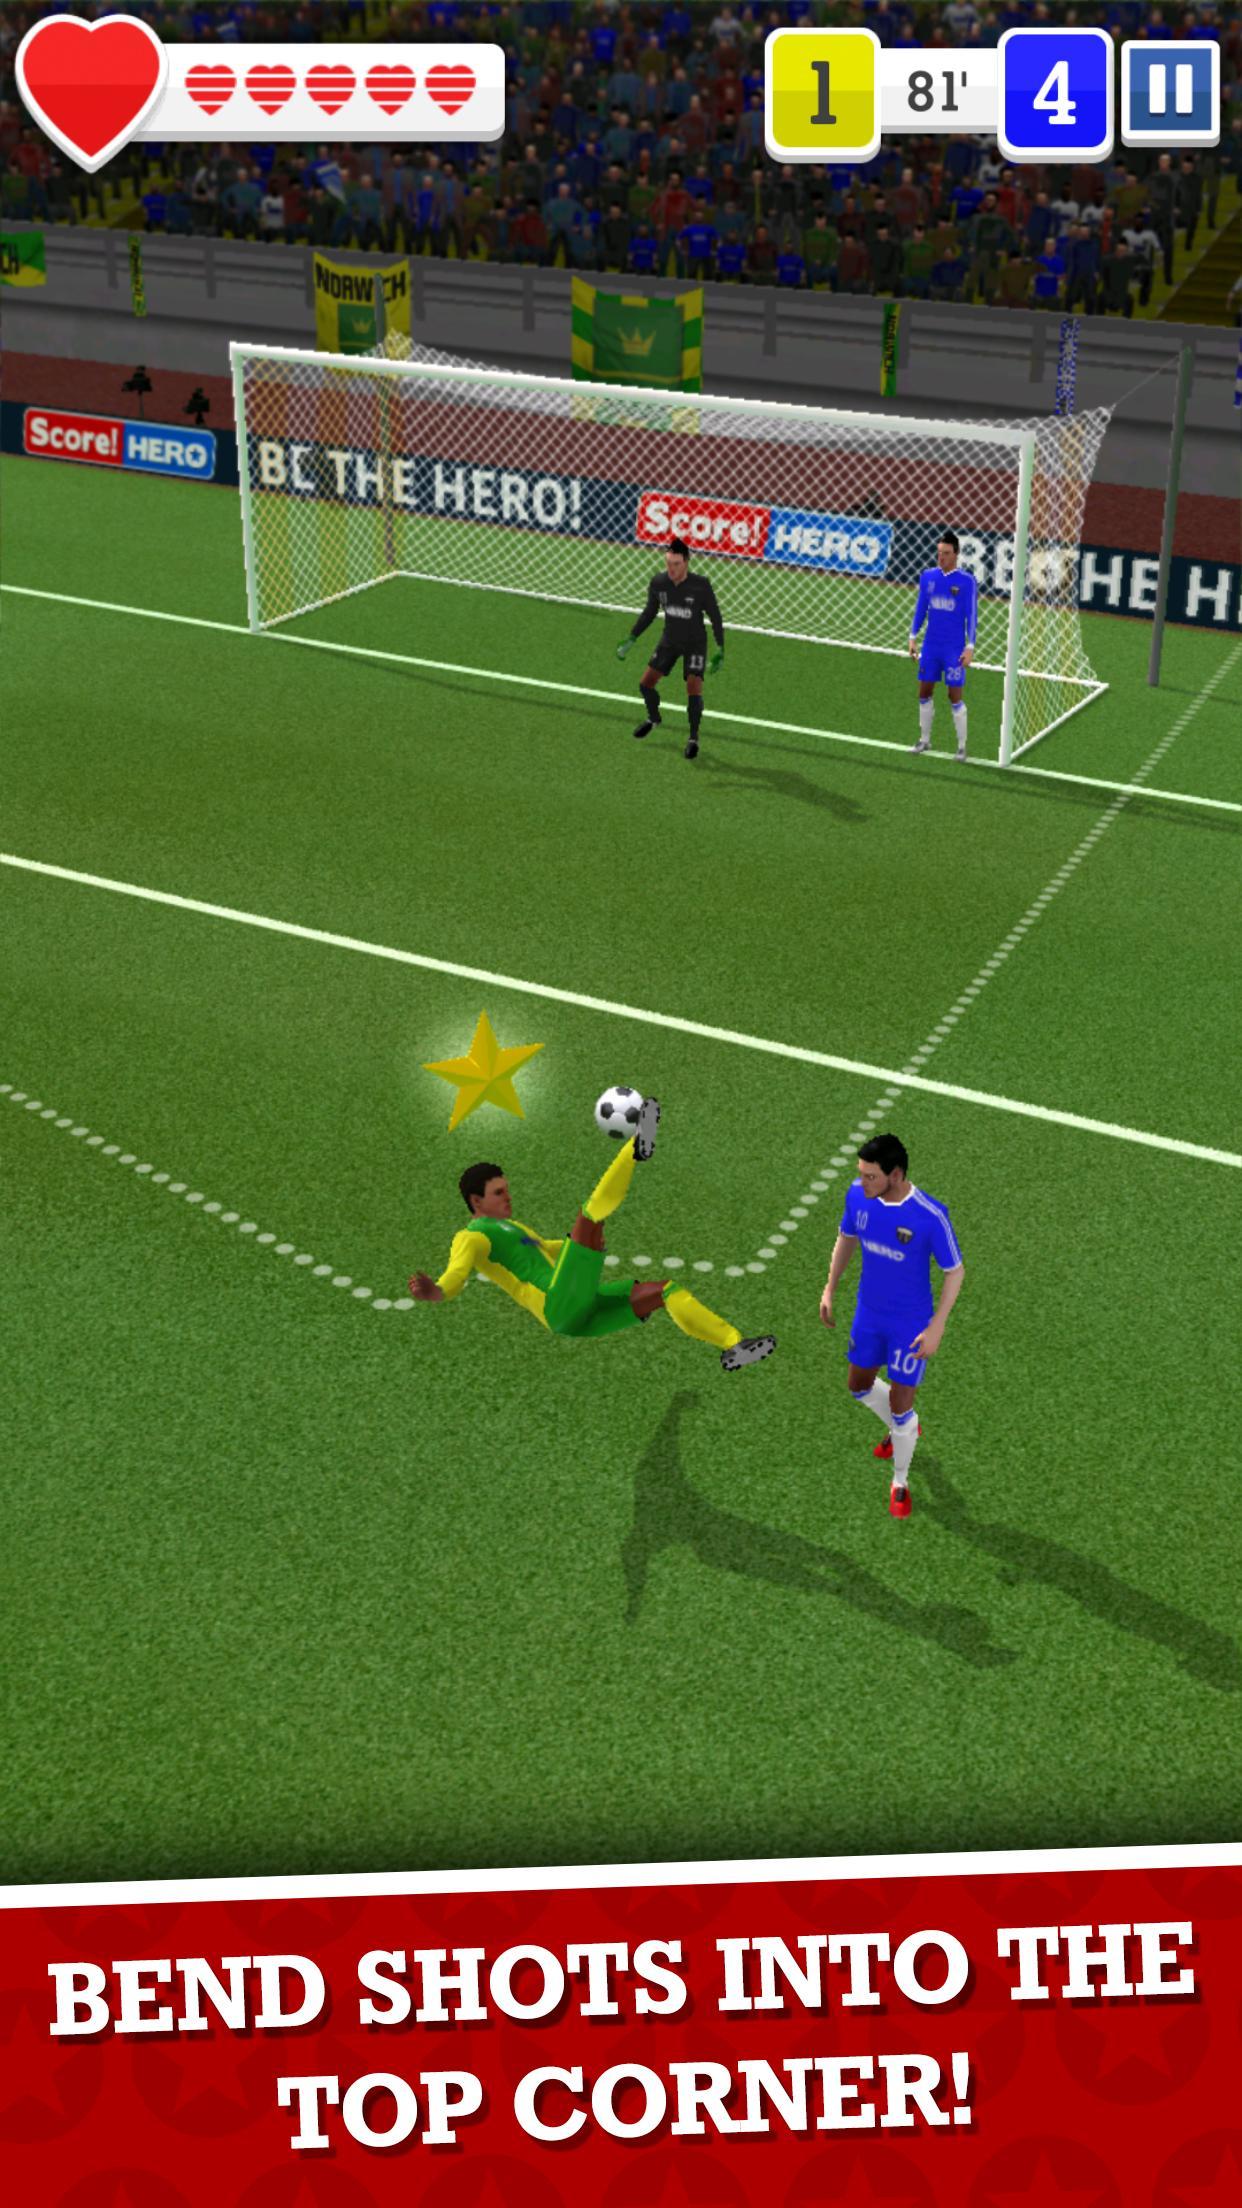 Score! Hero hack apk mod By Google play